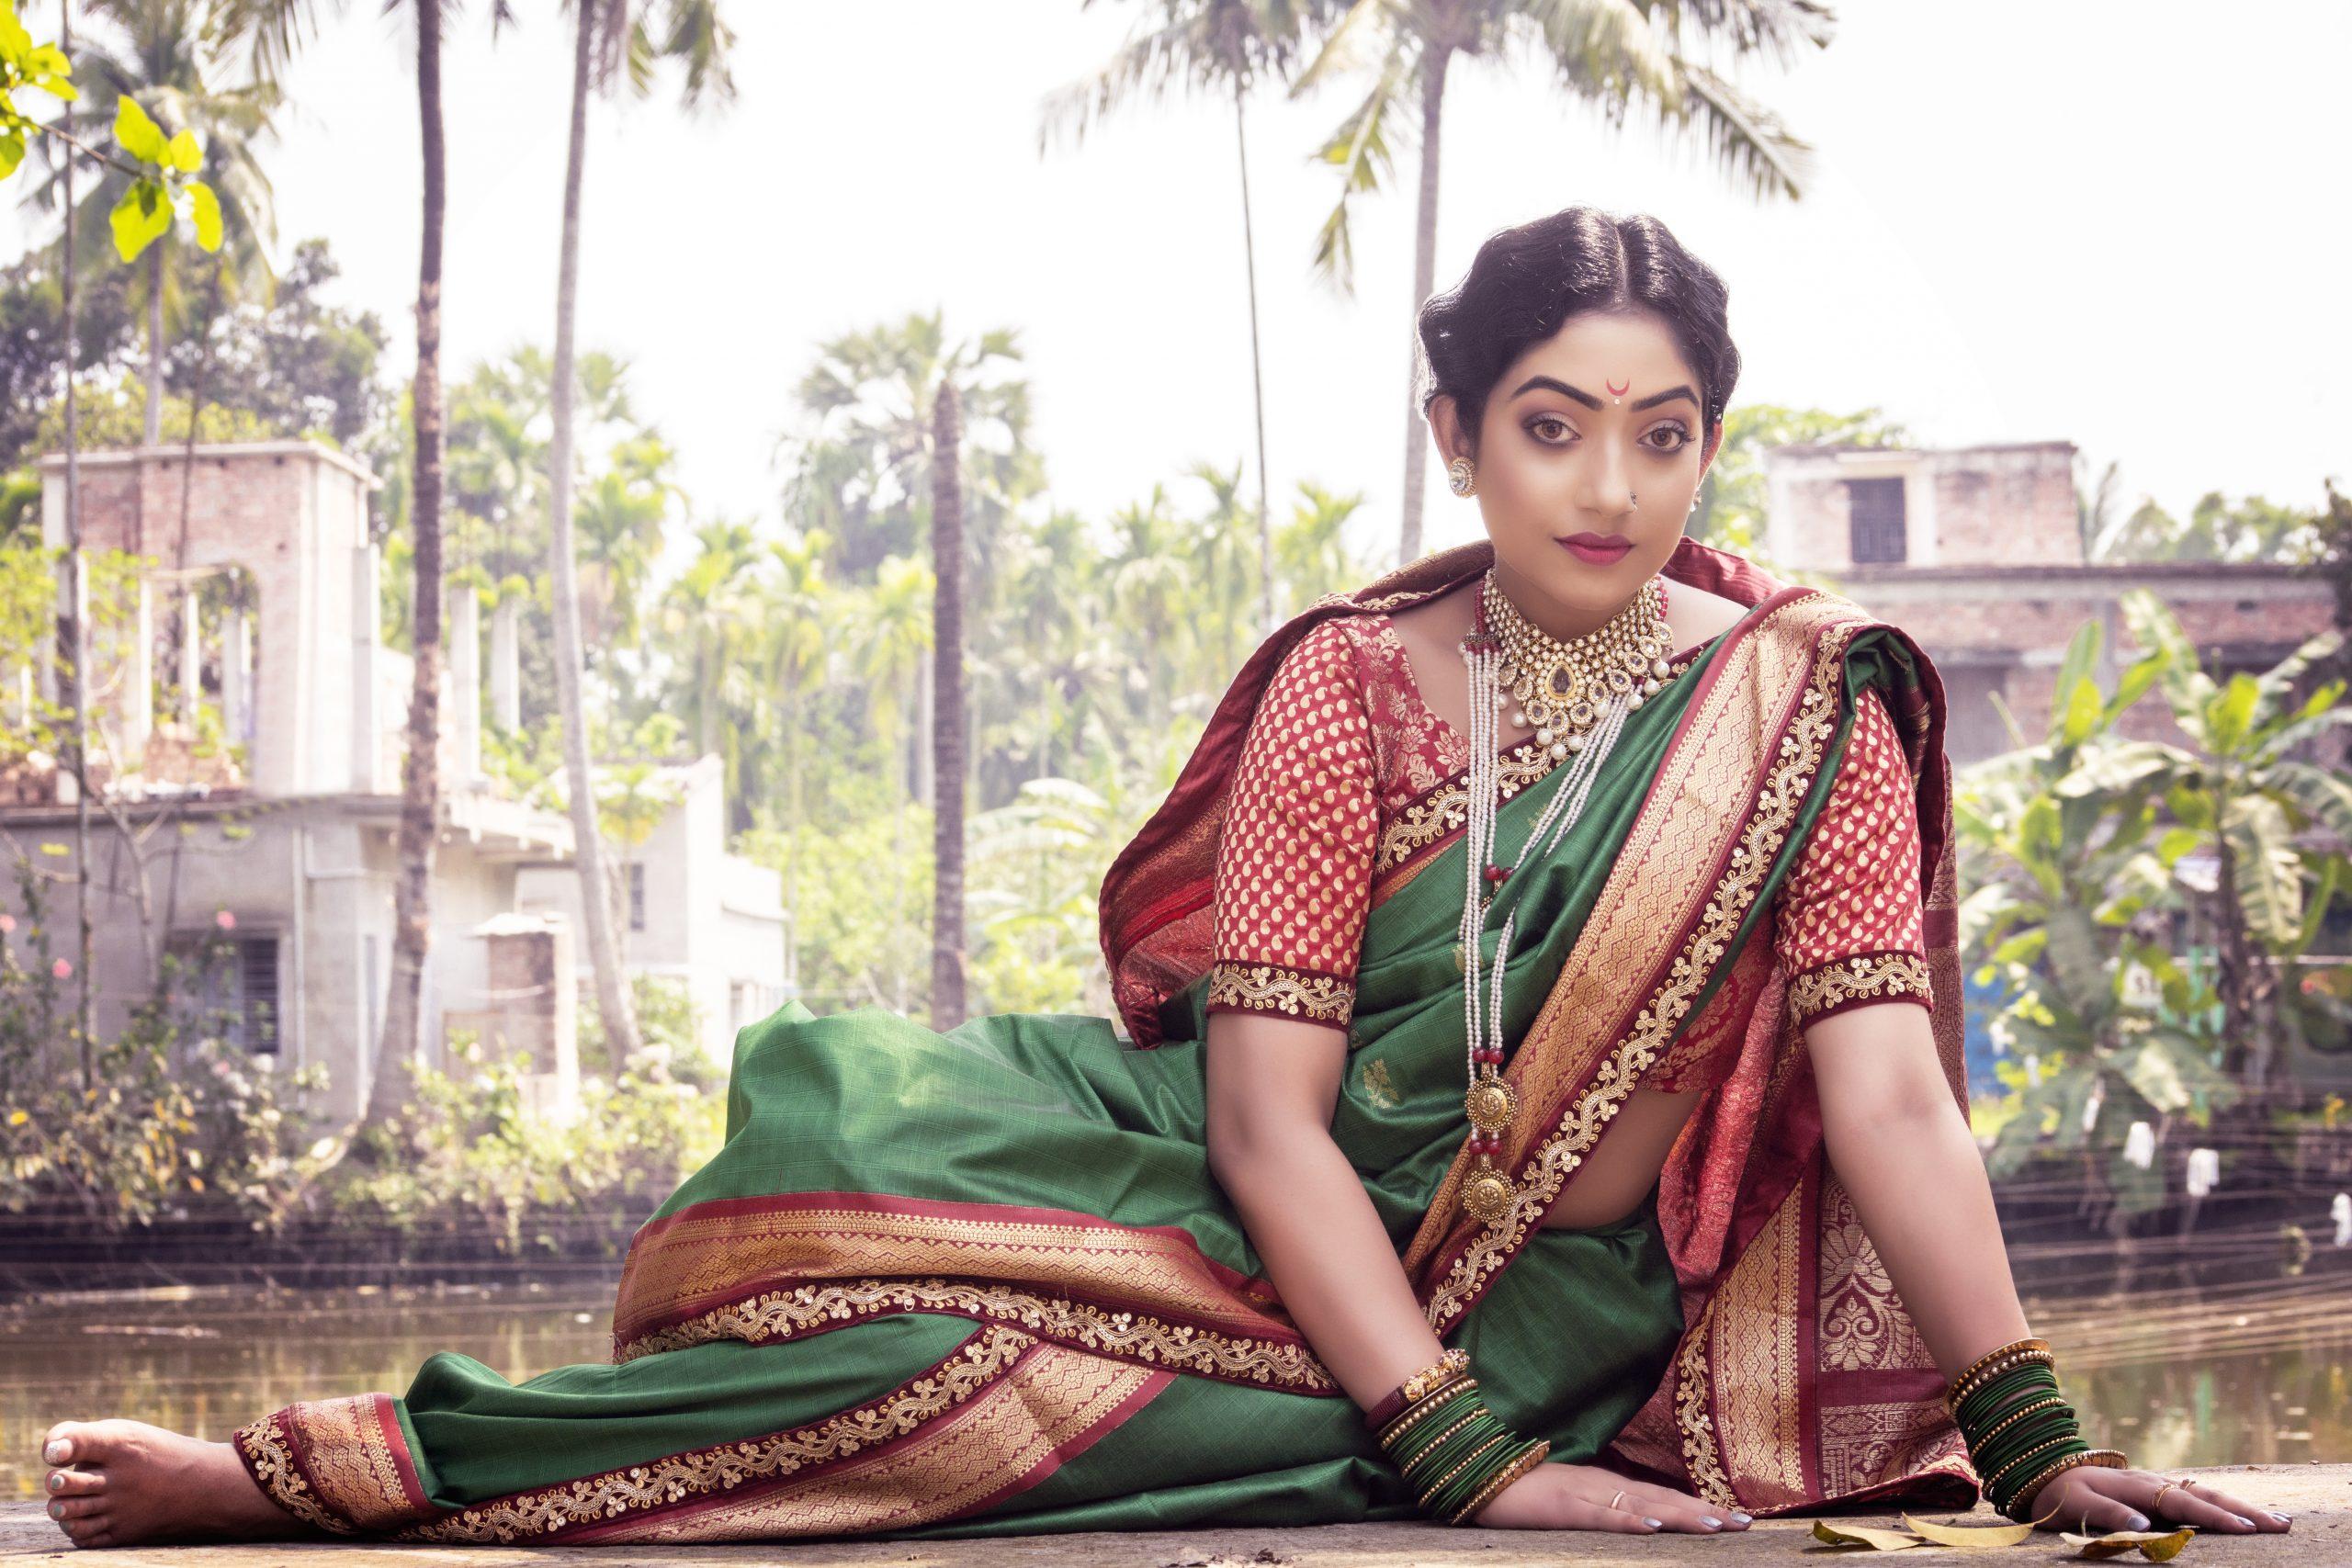 Indian woman in saree